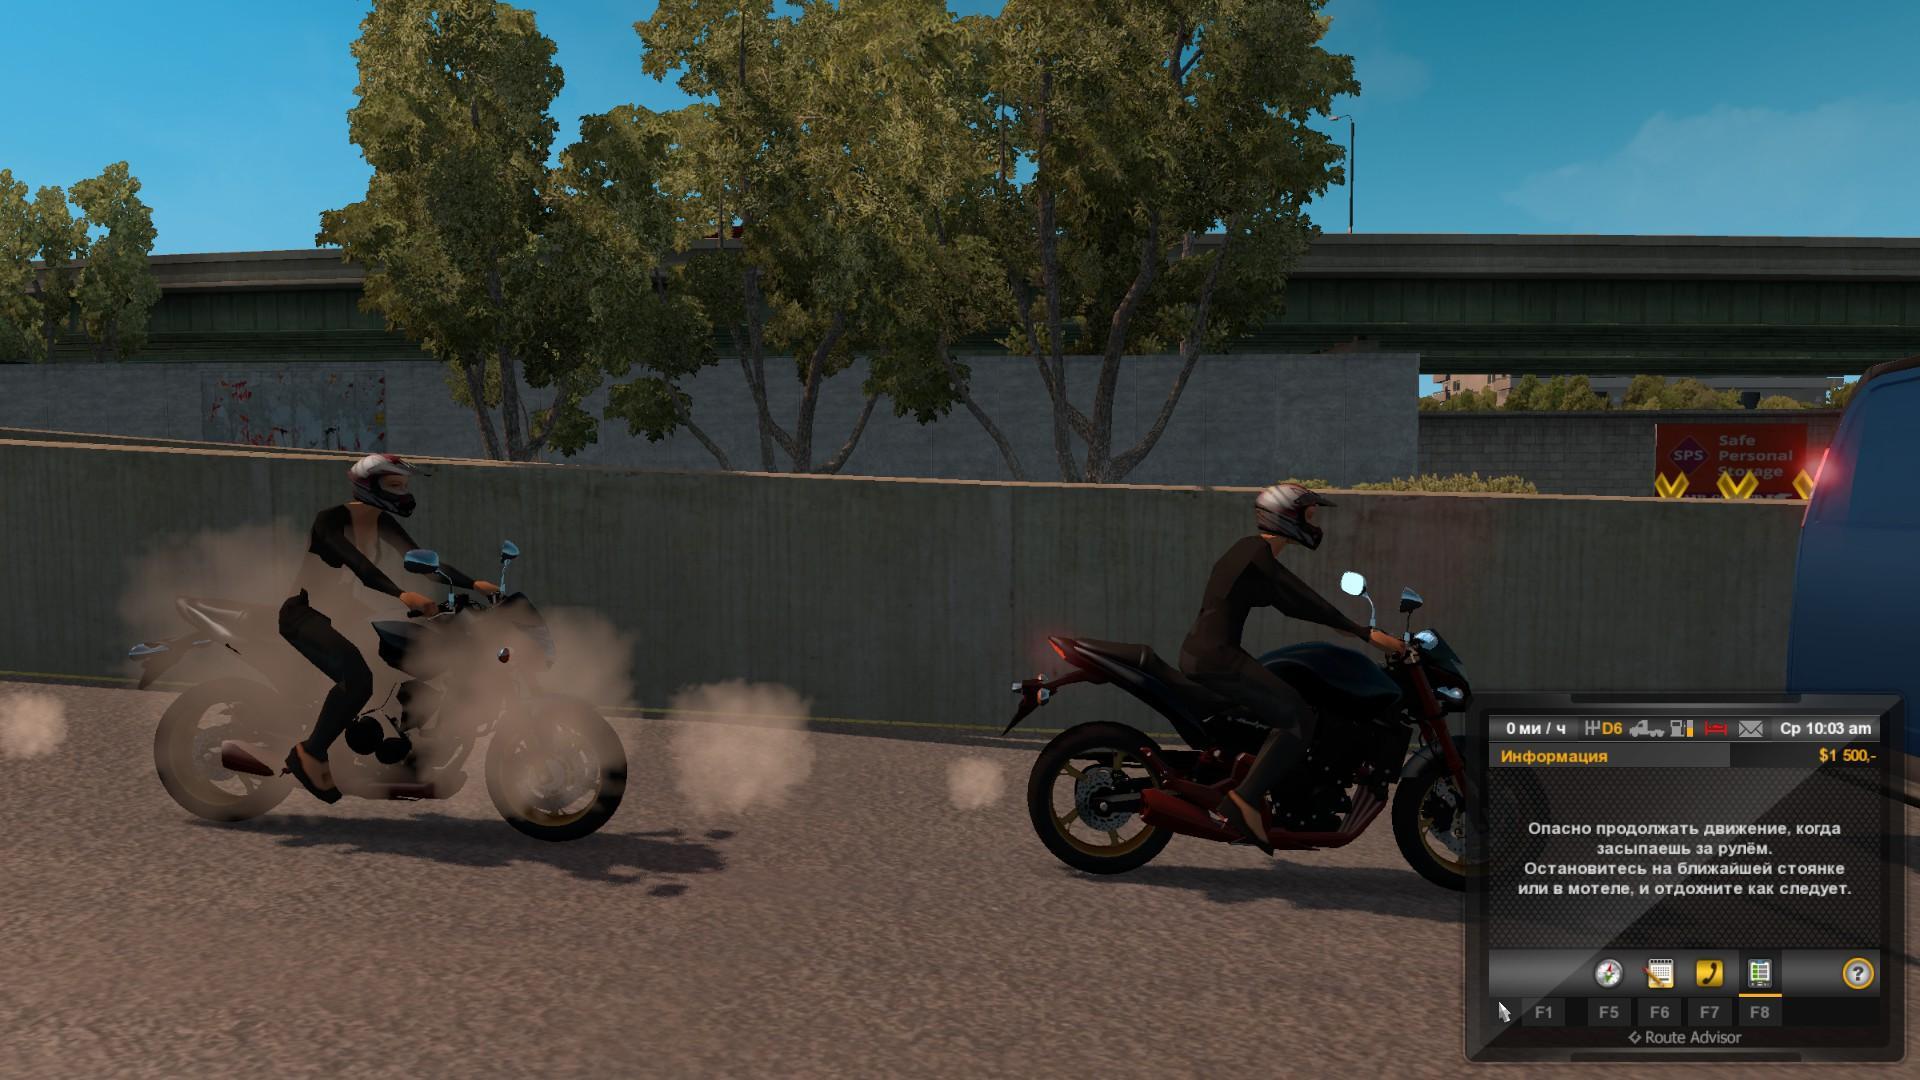 MOTORCYCLE-IN-TRAFFIC-V1.0.0-MOD-1.jpg